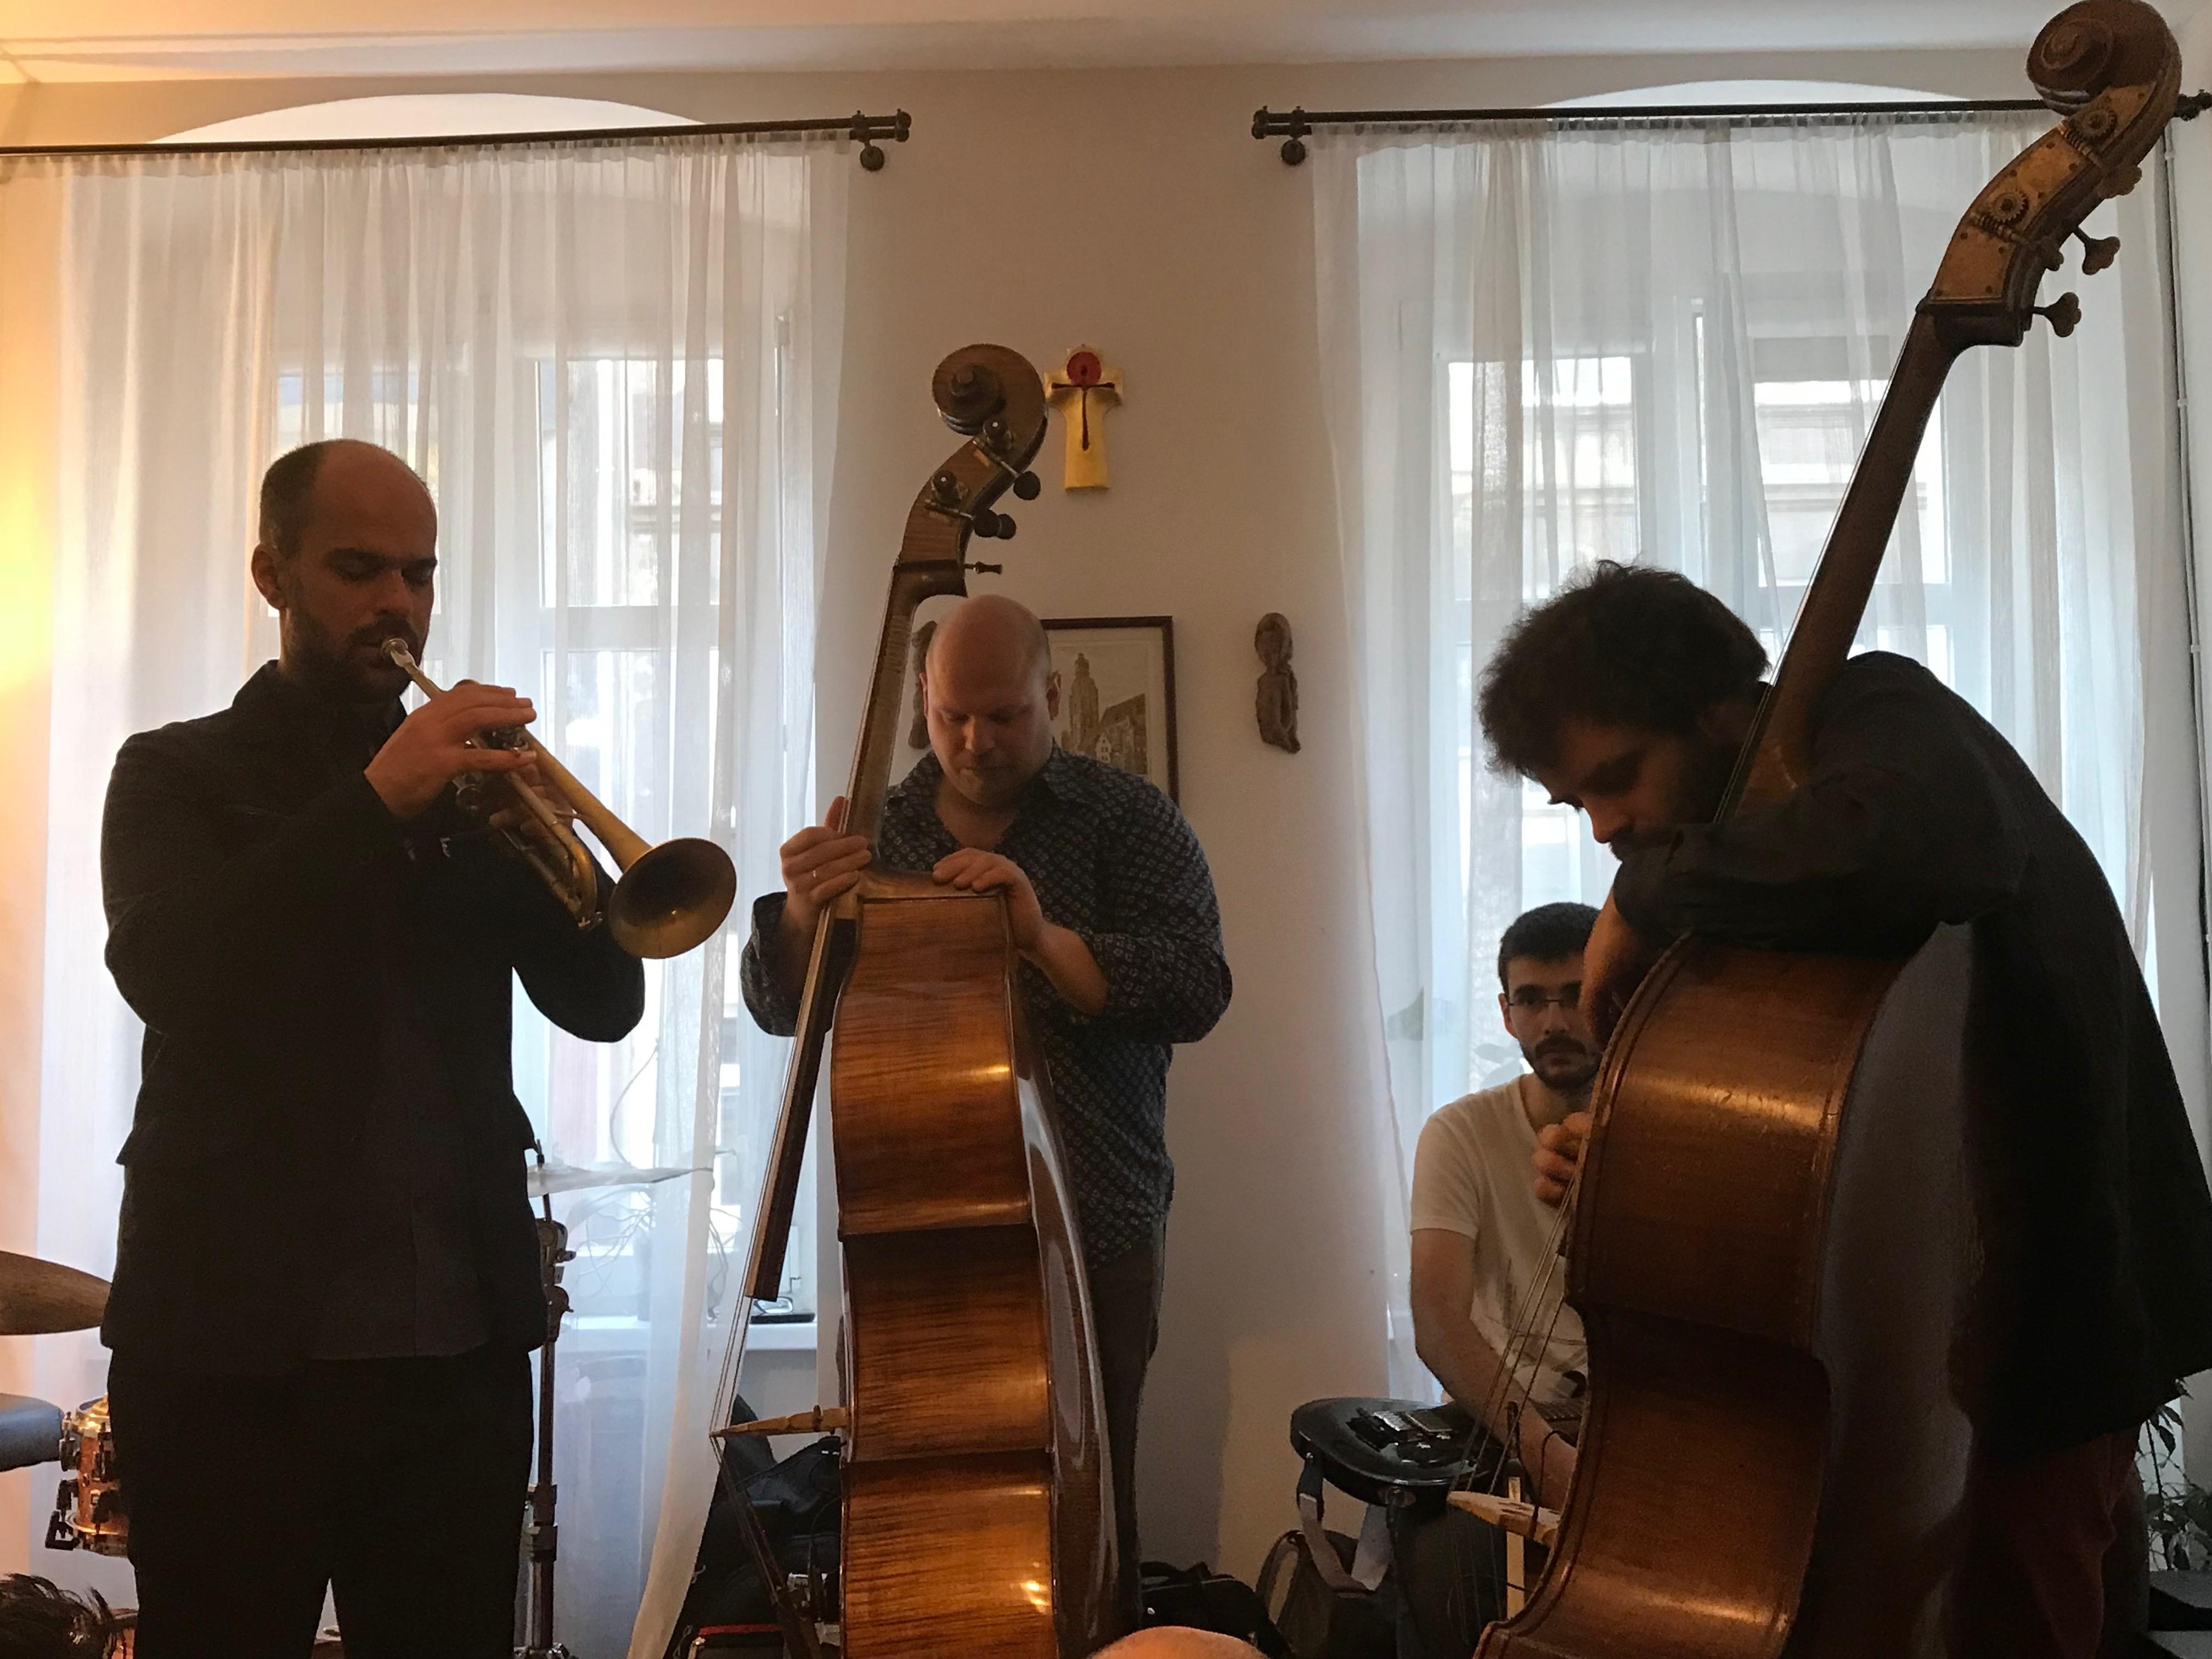 Amir ElSaffar, Ksawery Wojcinski, Michal Sember, Mikolay Nowicki - Jazztopad 2018